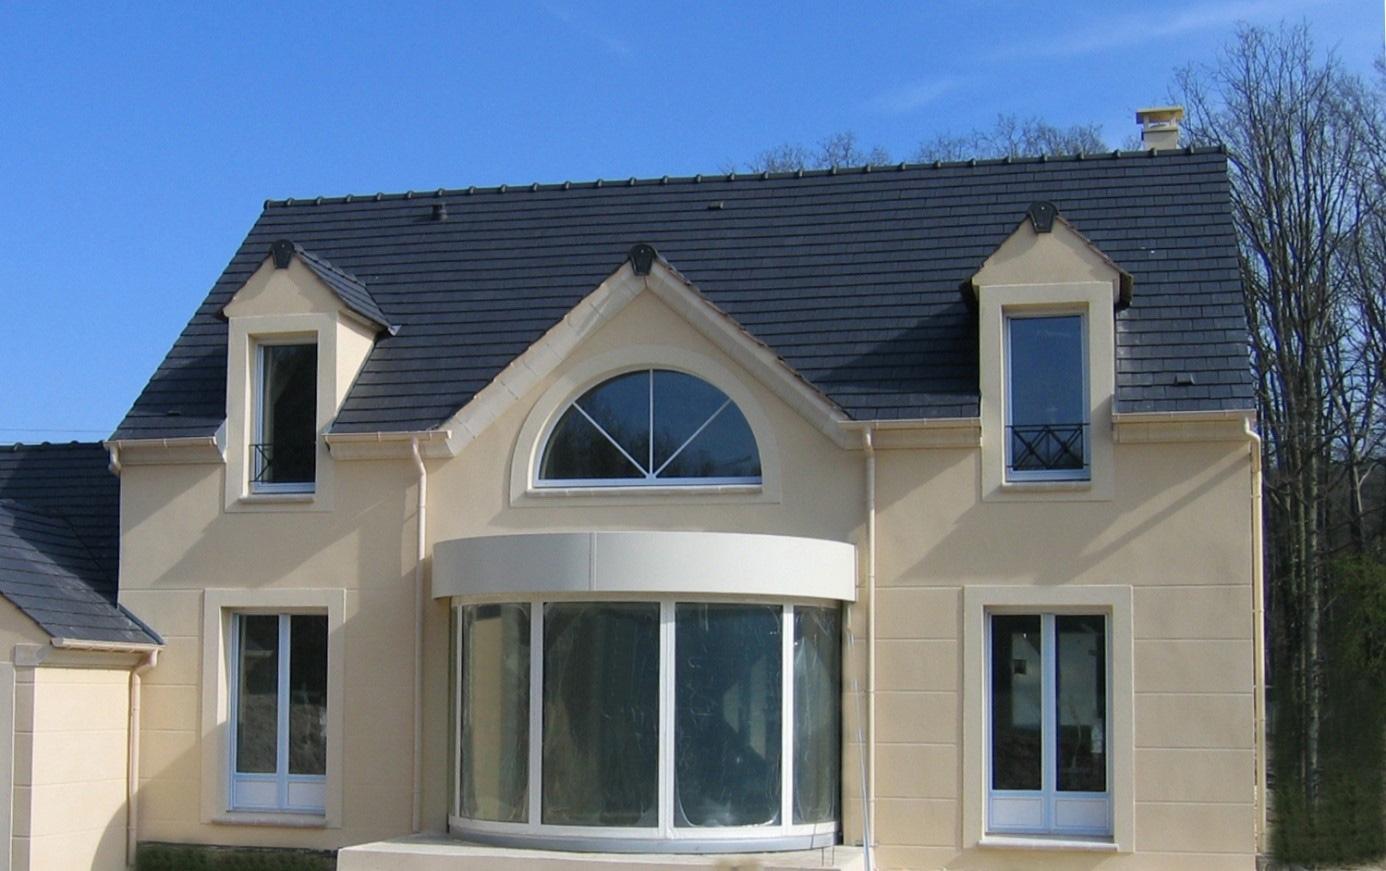 Maison a construire plan exemple de plan de maison - Construire sa maison com plan ...